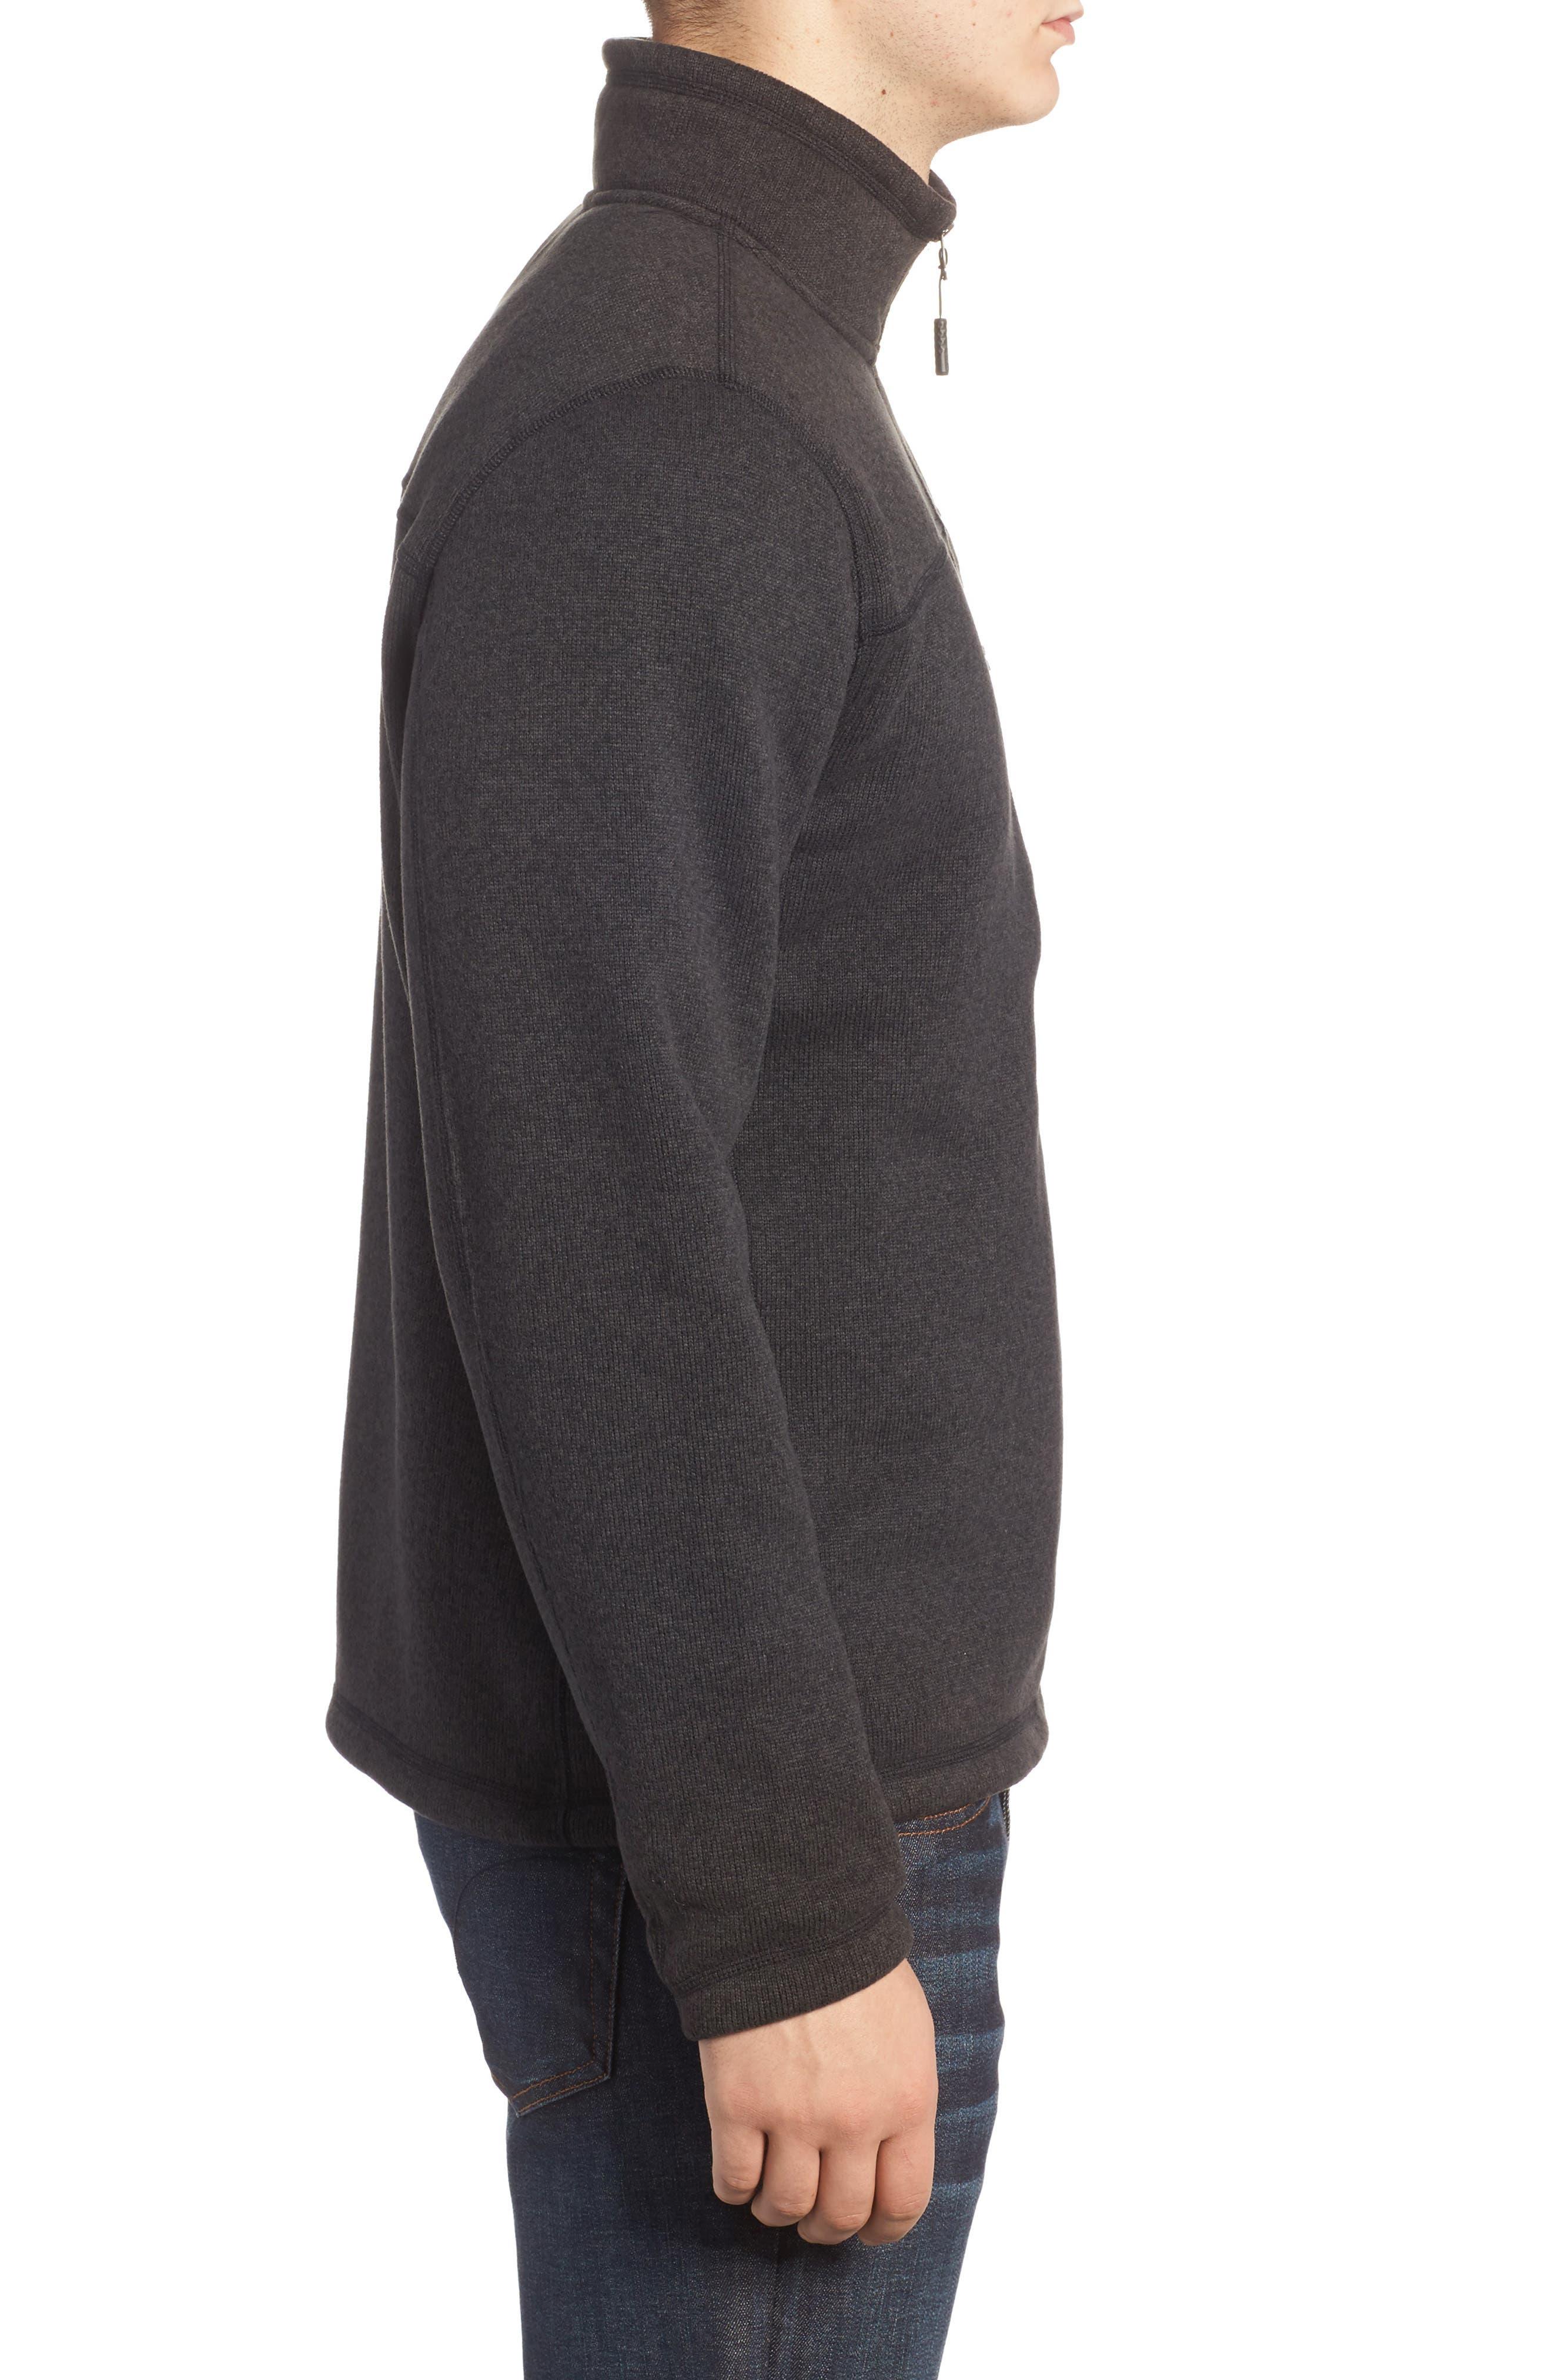 THE NORTH FACE, Gordon Lyons Quarter-Zip Fleece Jacket, Alternate thumbnail 4, color, 001